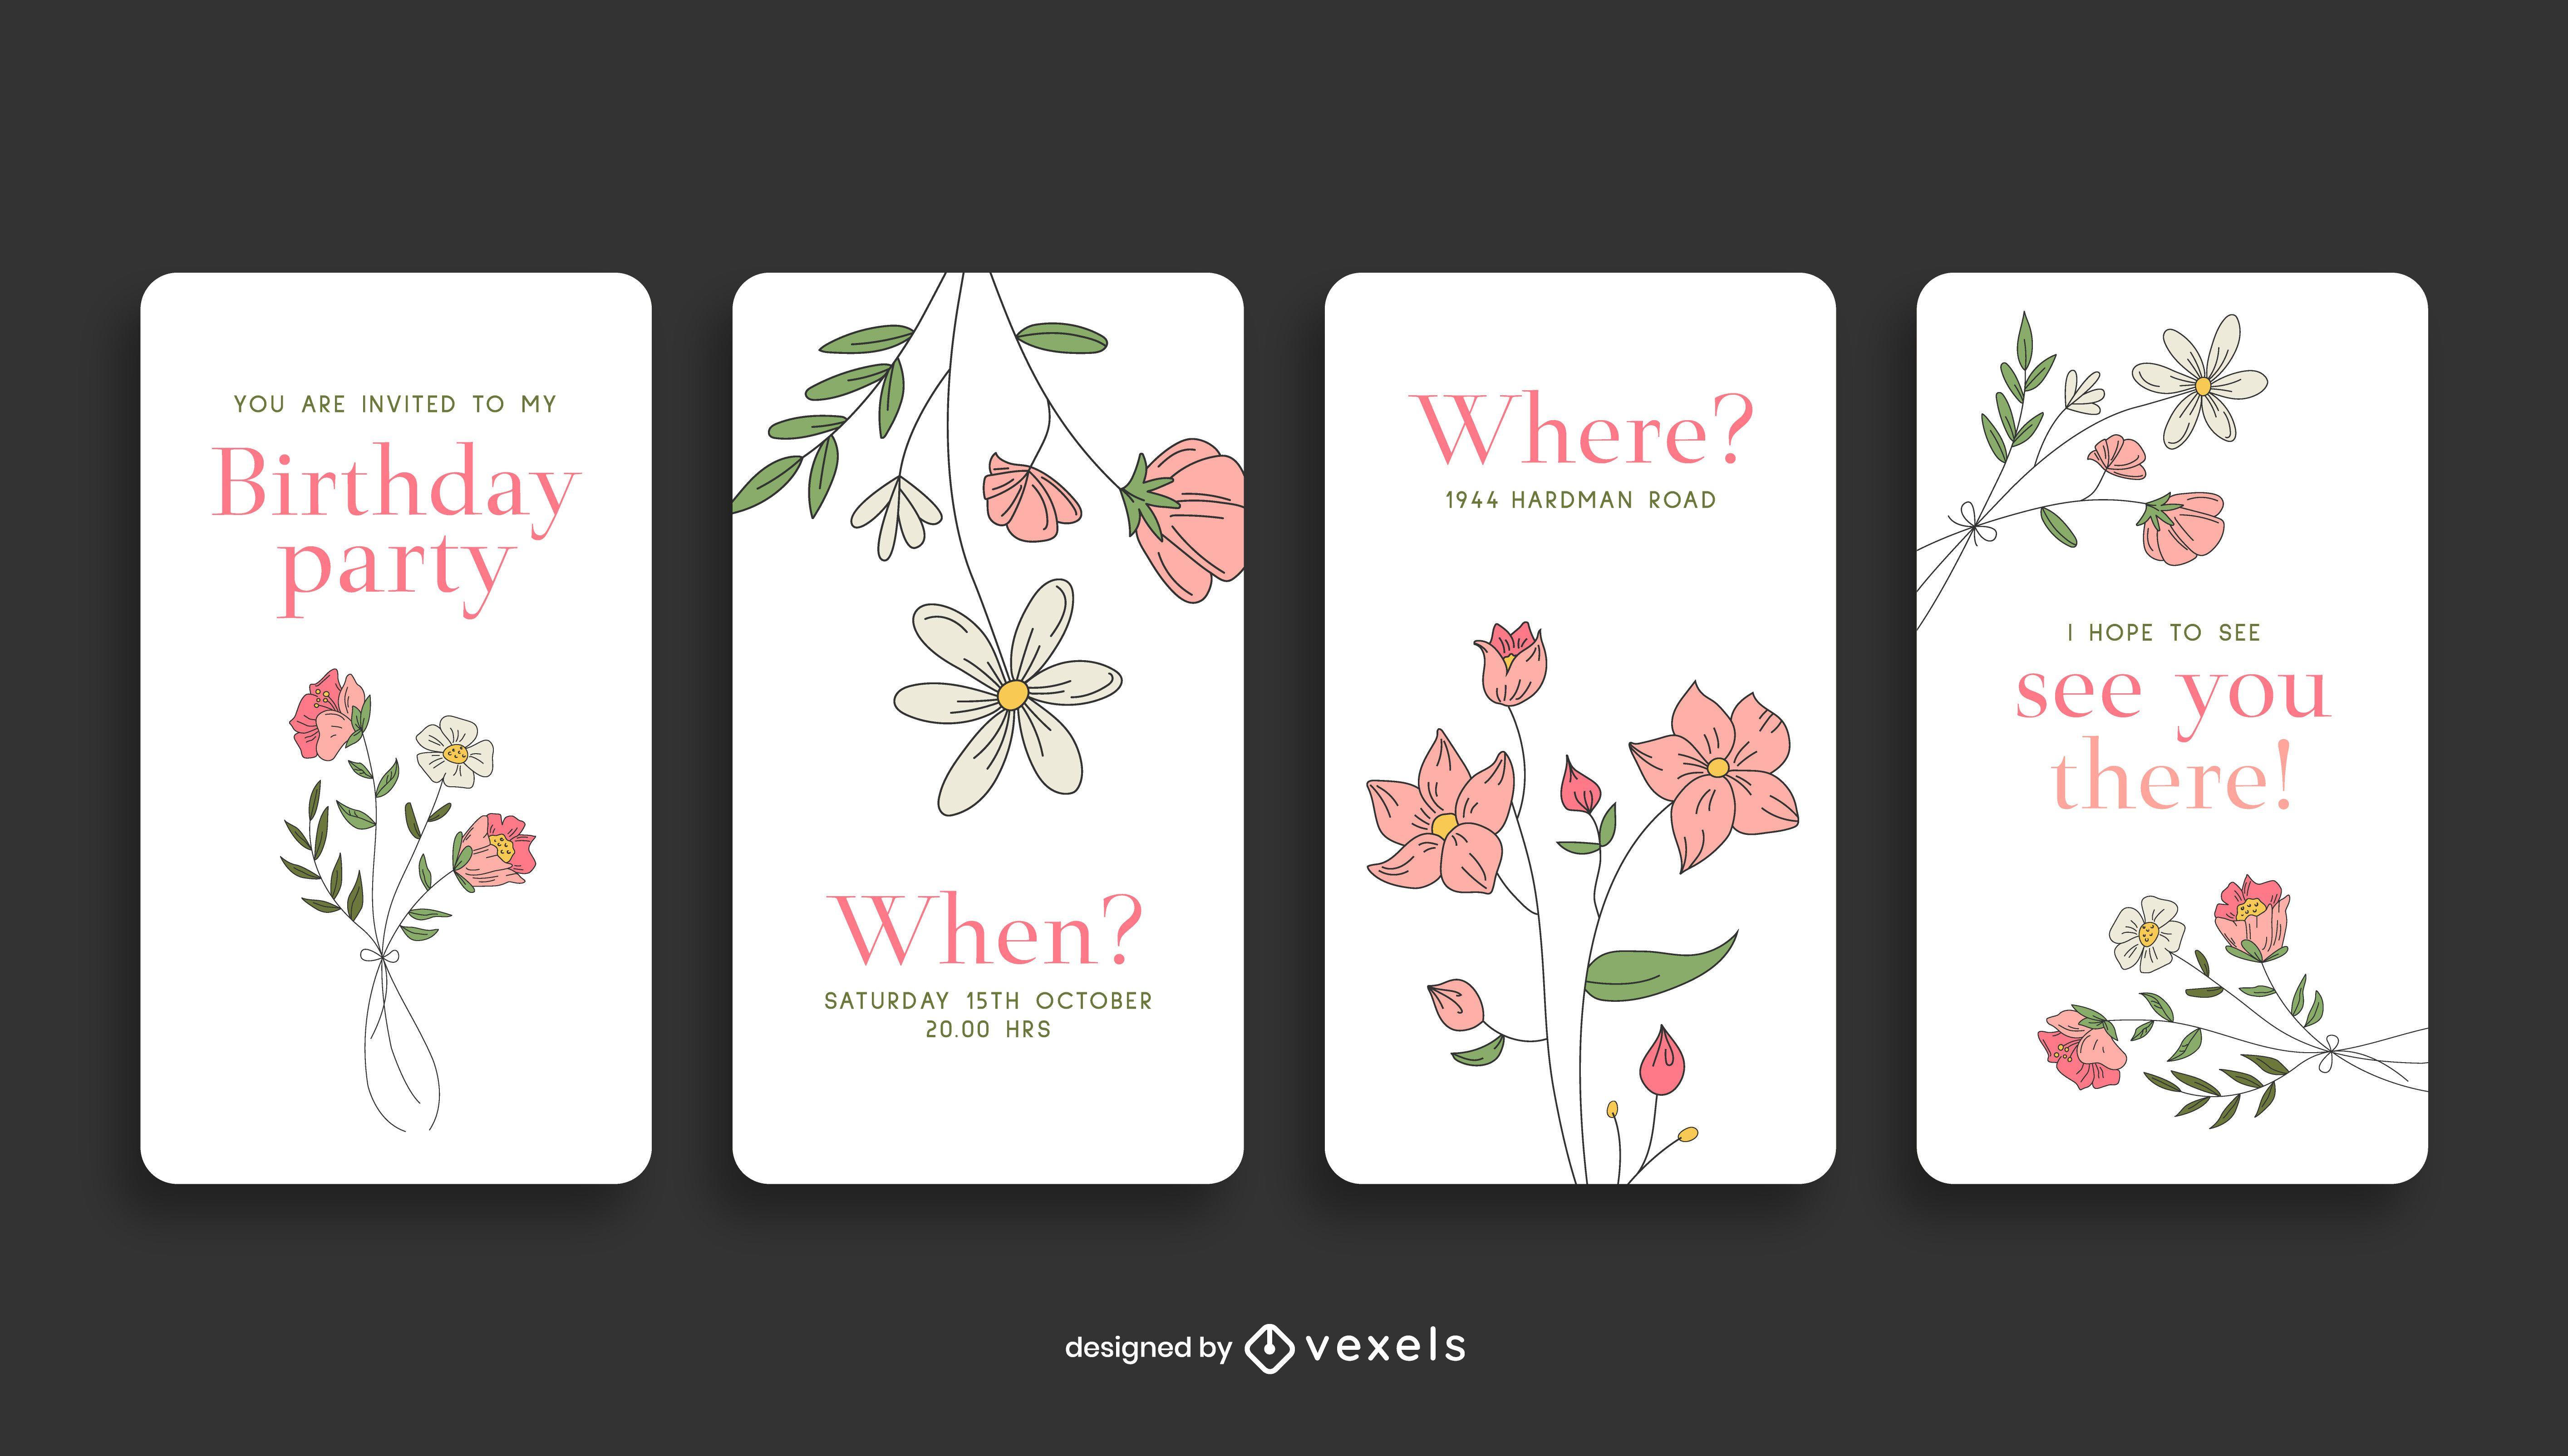 Floral birthday invitation social media story